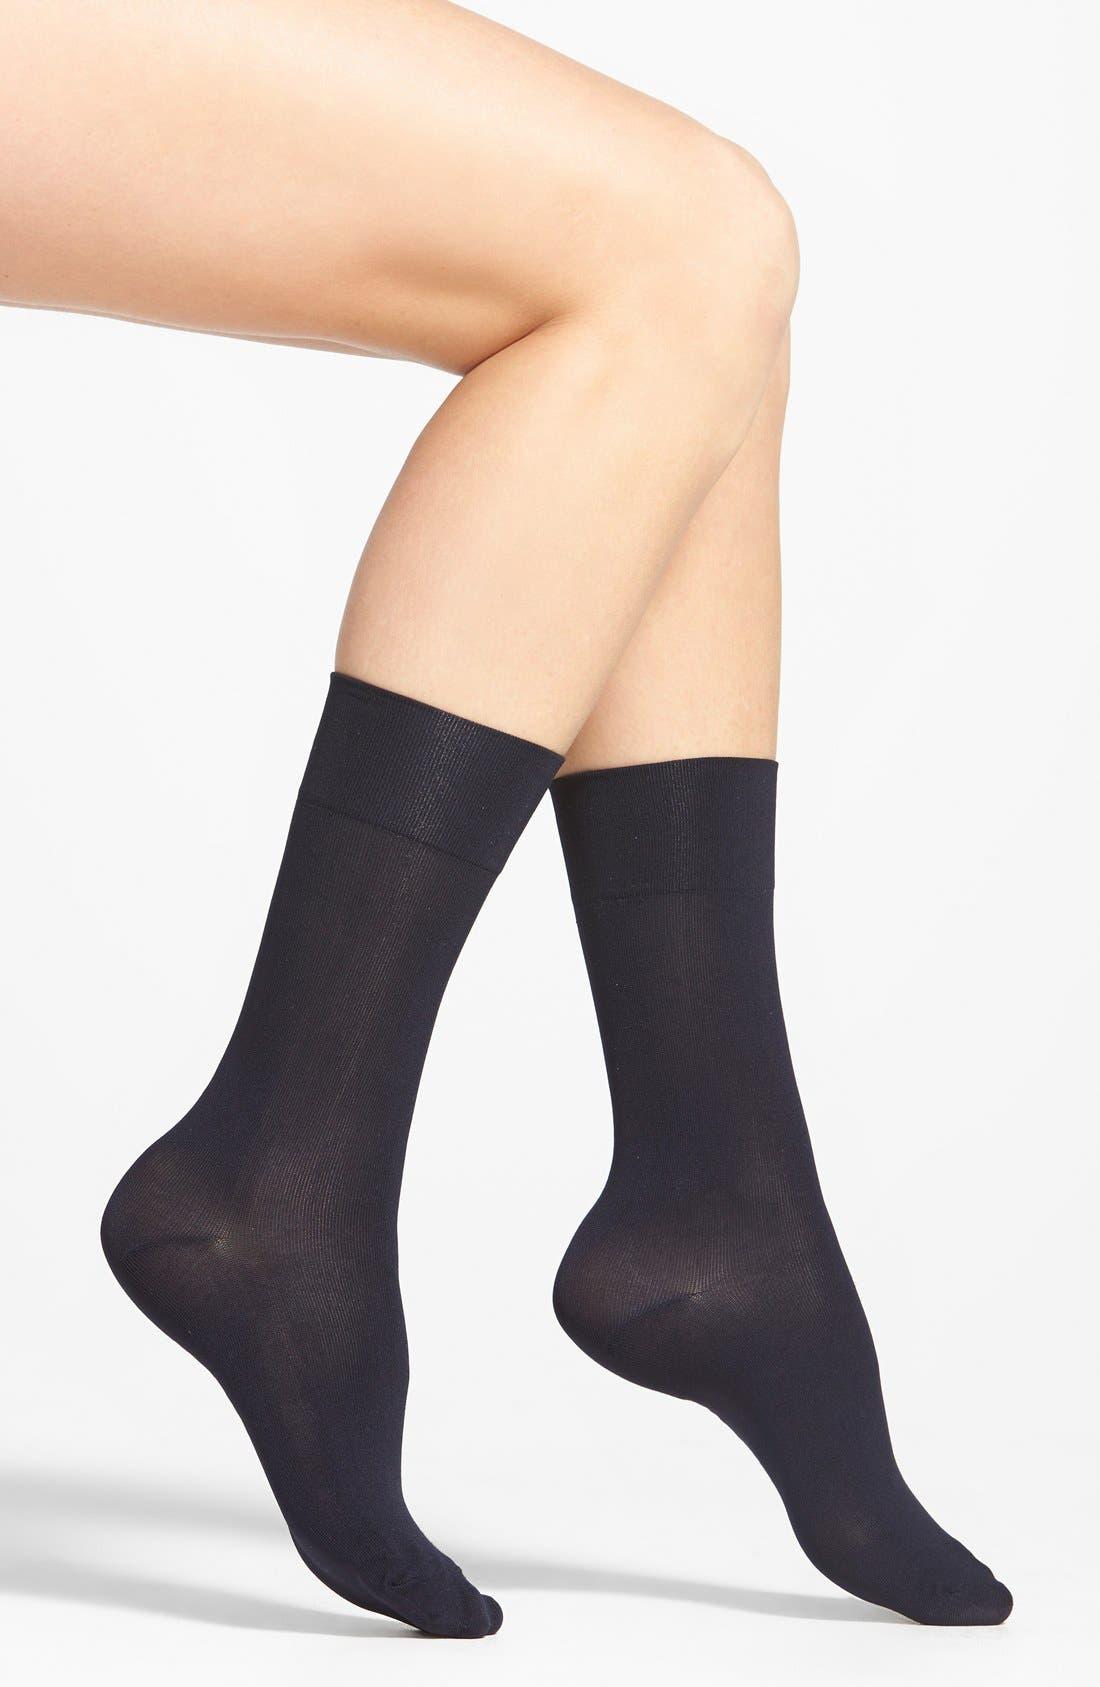 Ultrasmooth Socks,                         Main,                         color, Navy